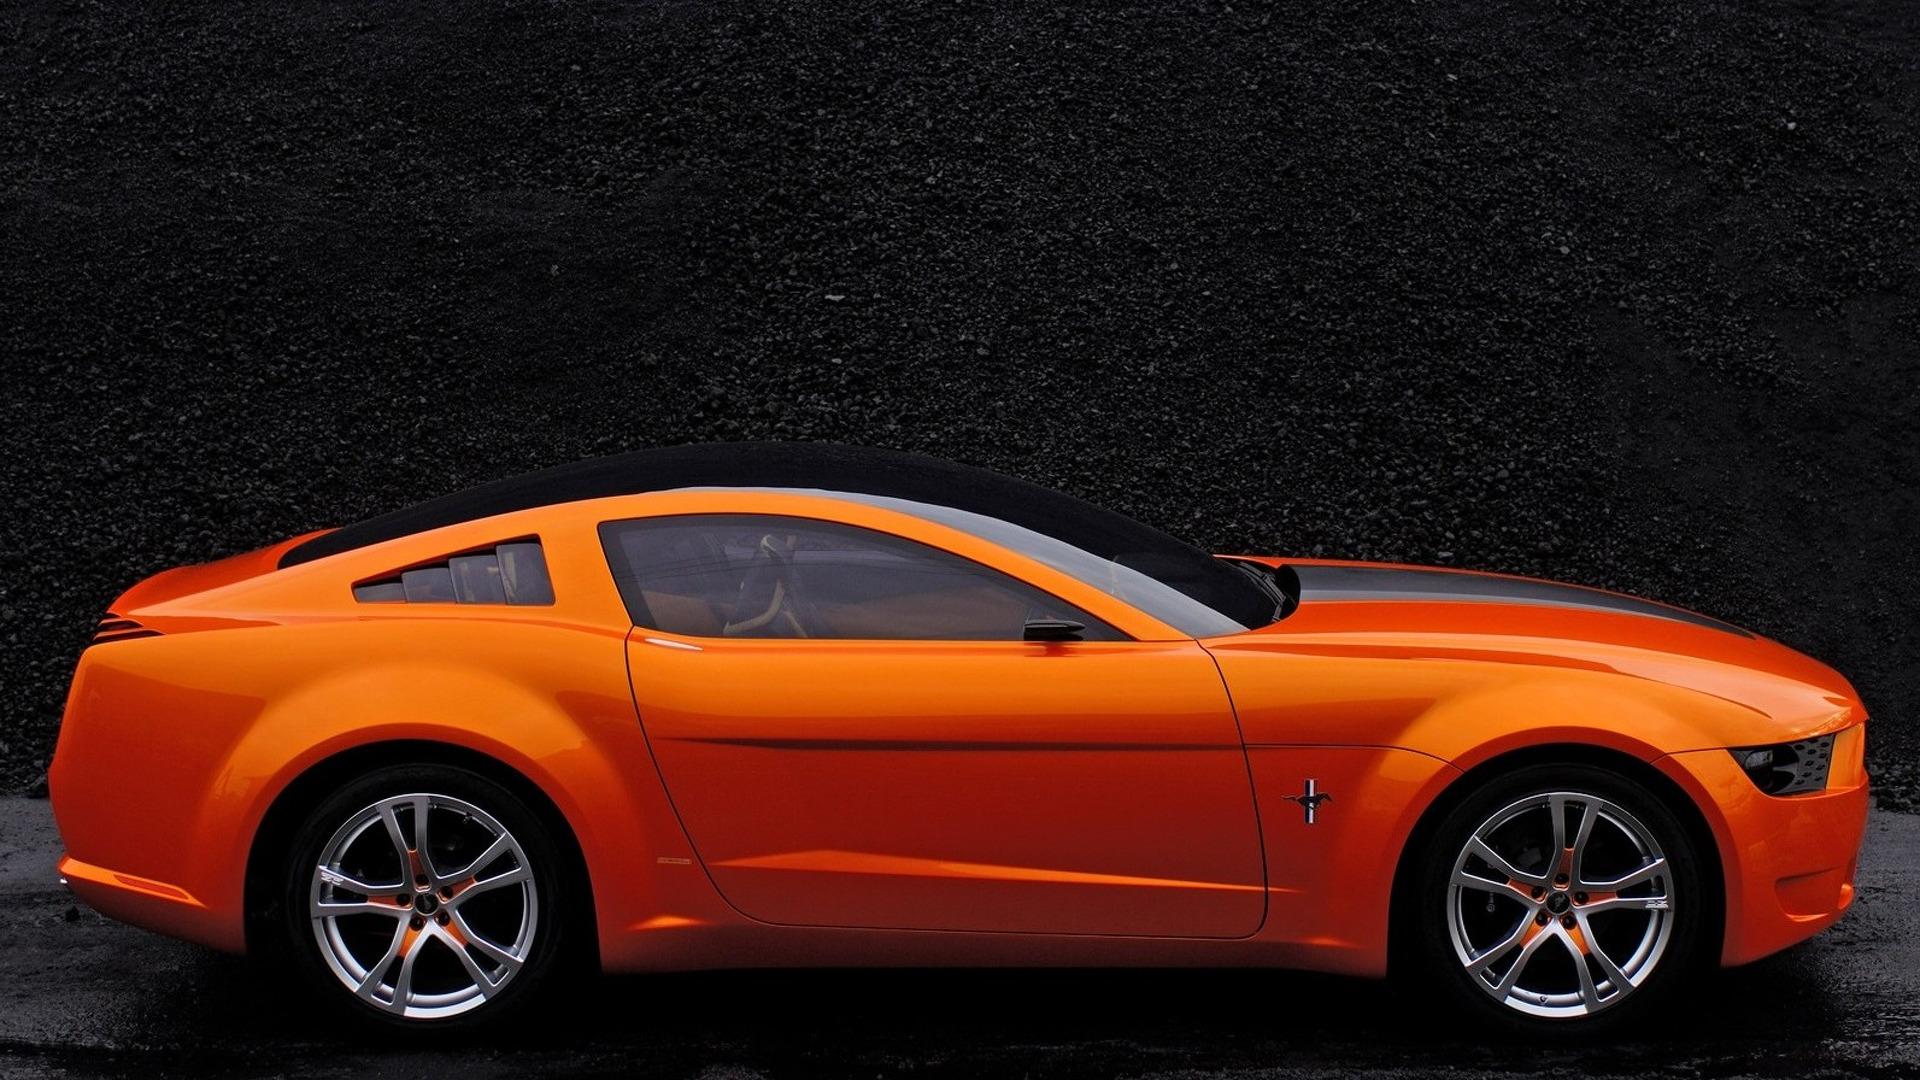 2006-ford-mustang-giugiaro-concept (11)